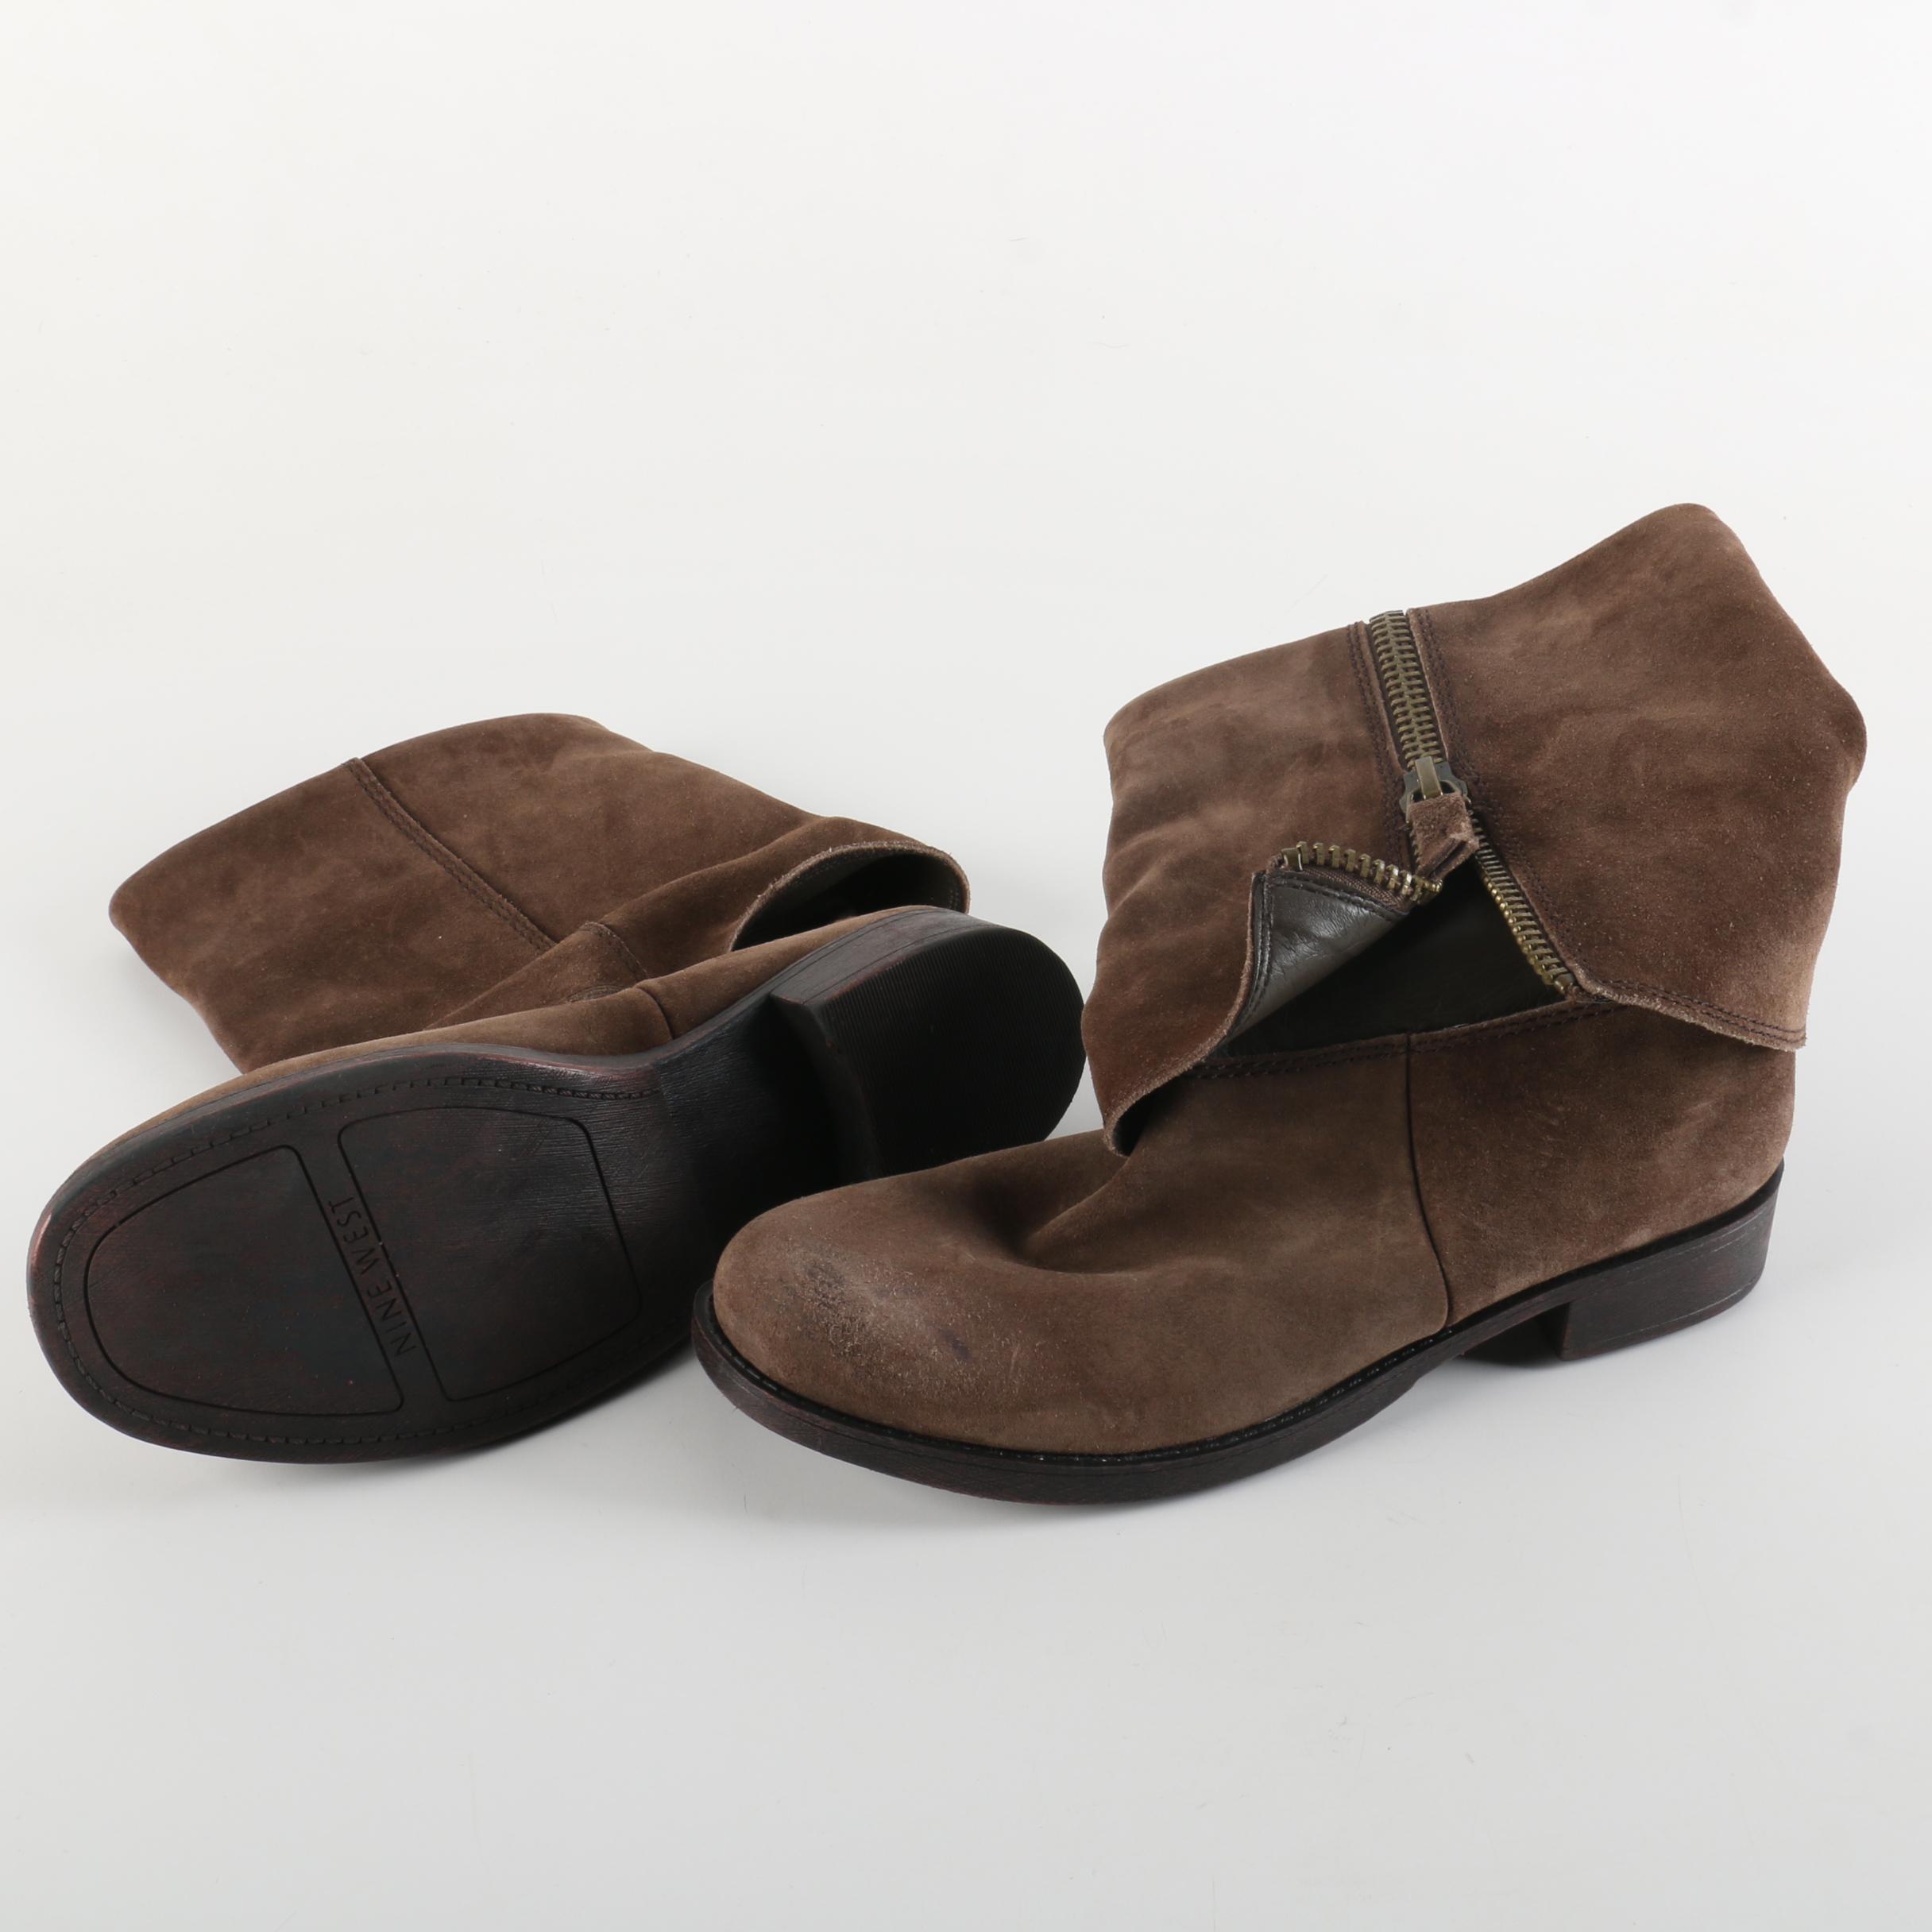 Nine West Brown Suede Boots